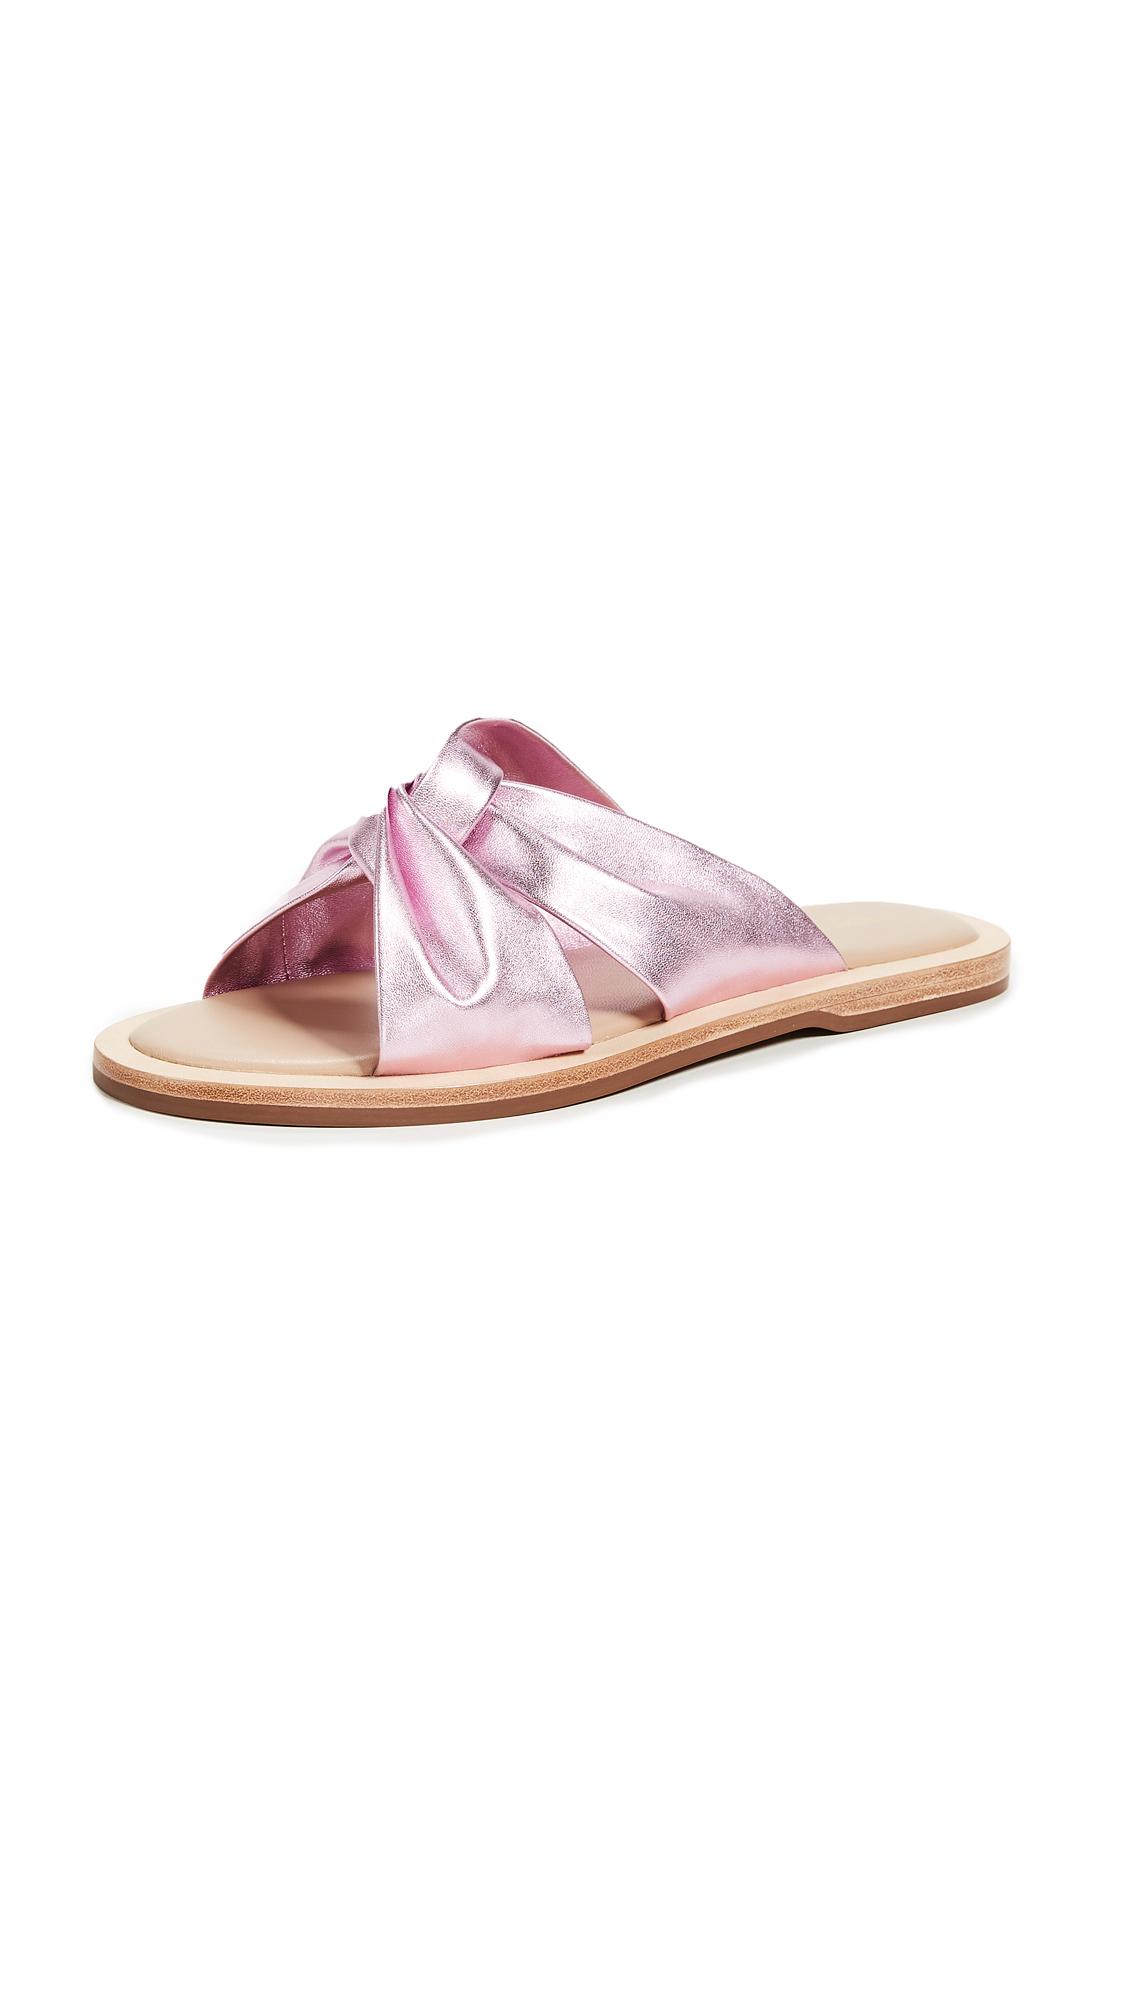 Rachel Zoe Hampton Flats - Pale Pink